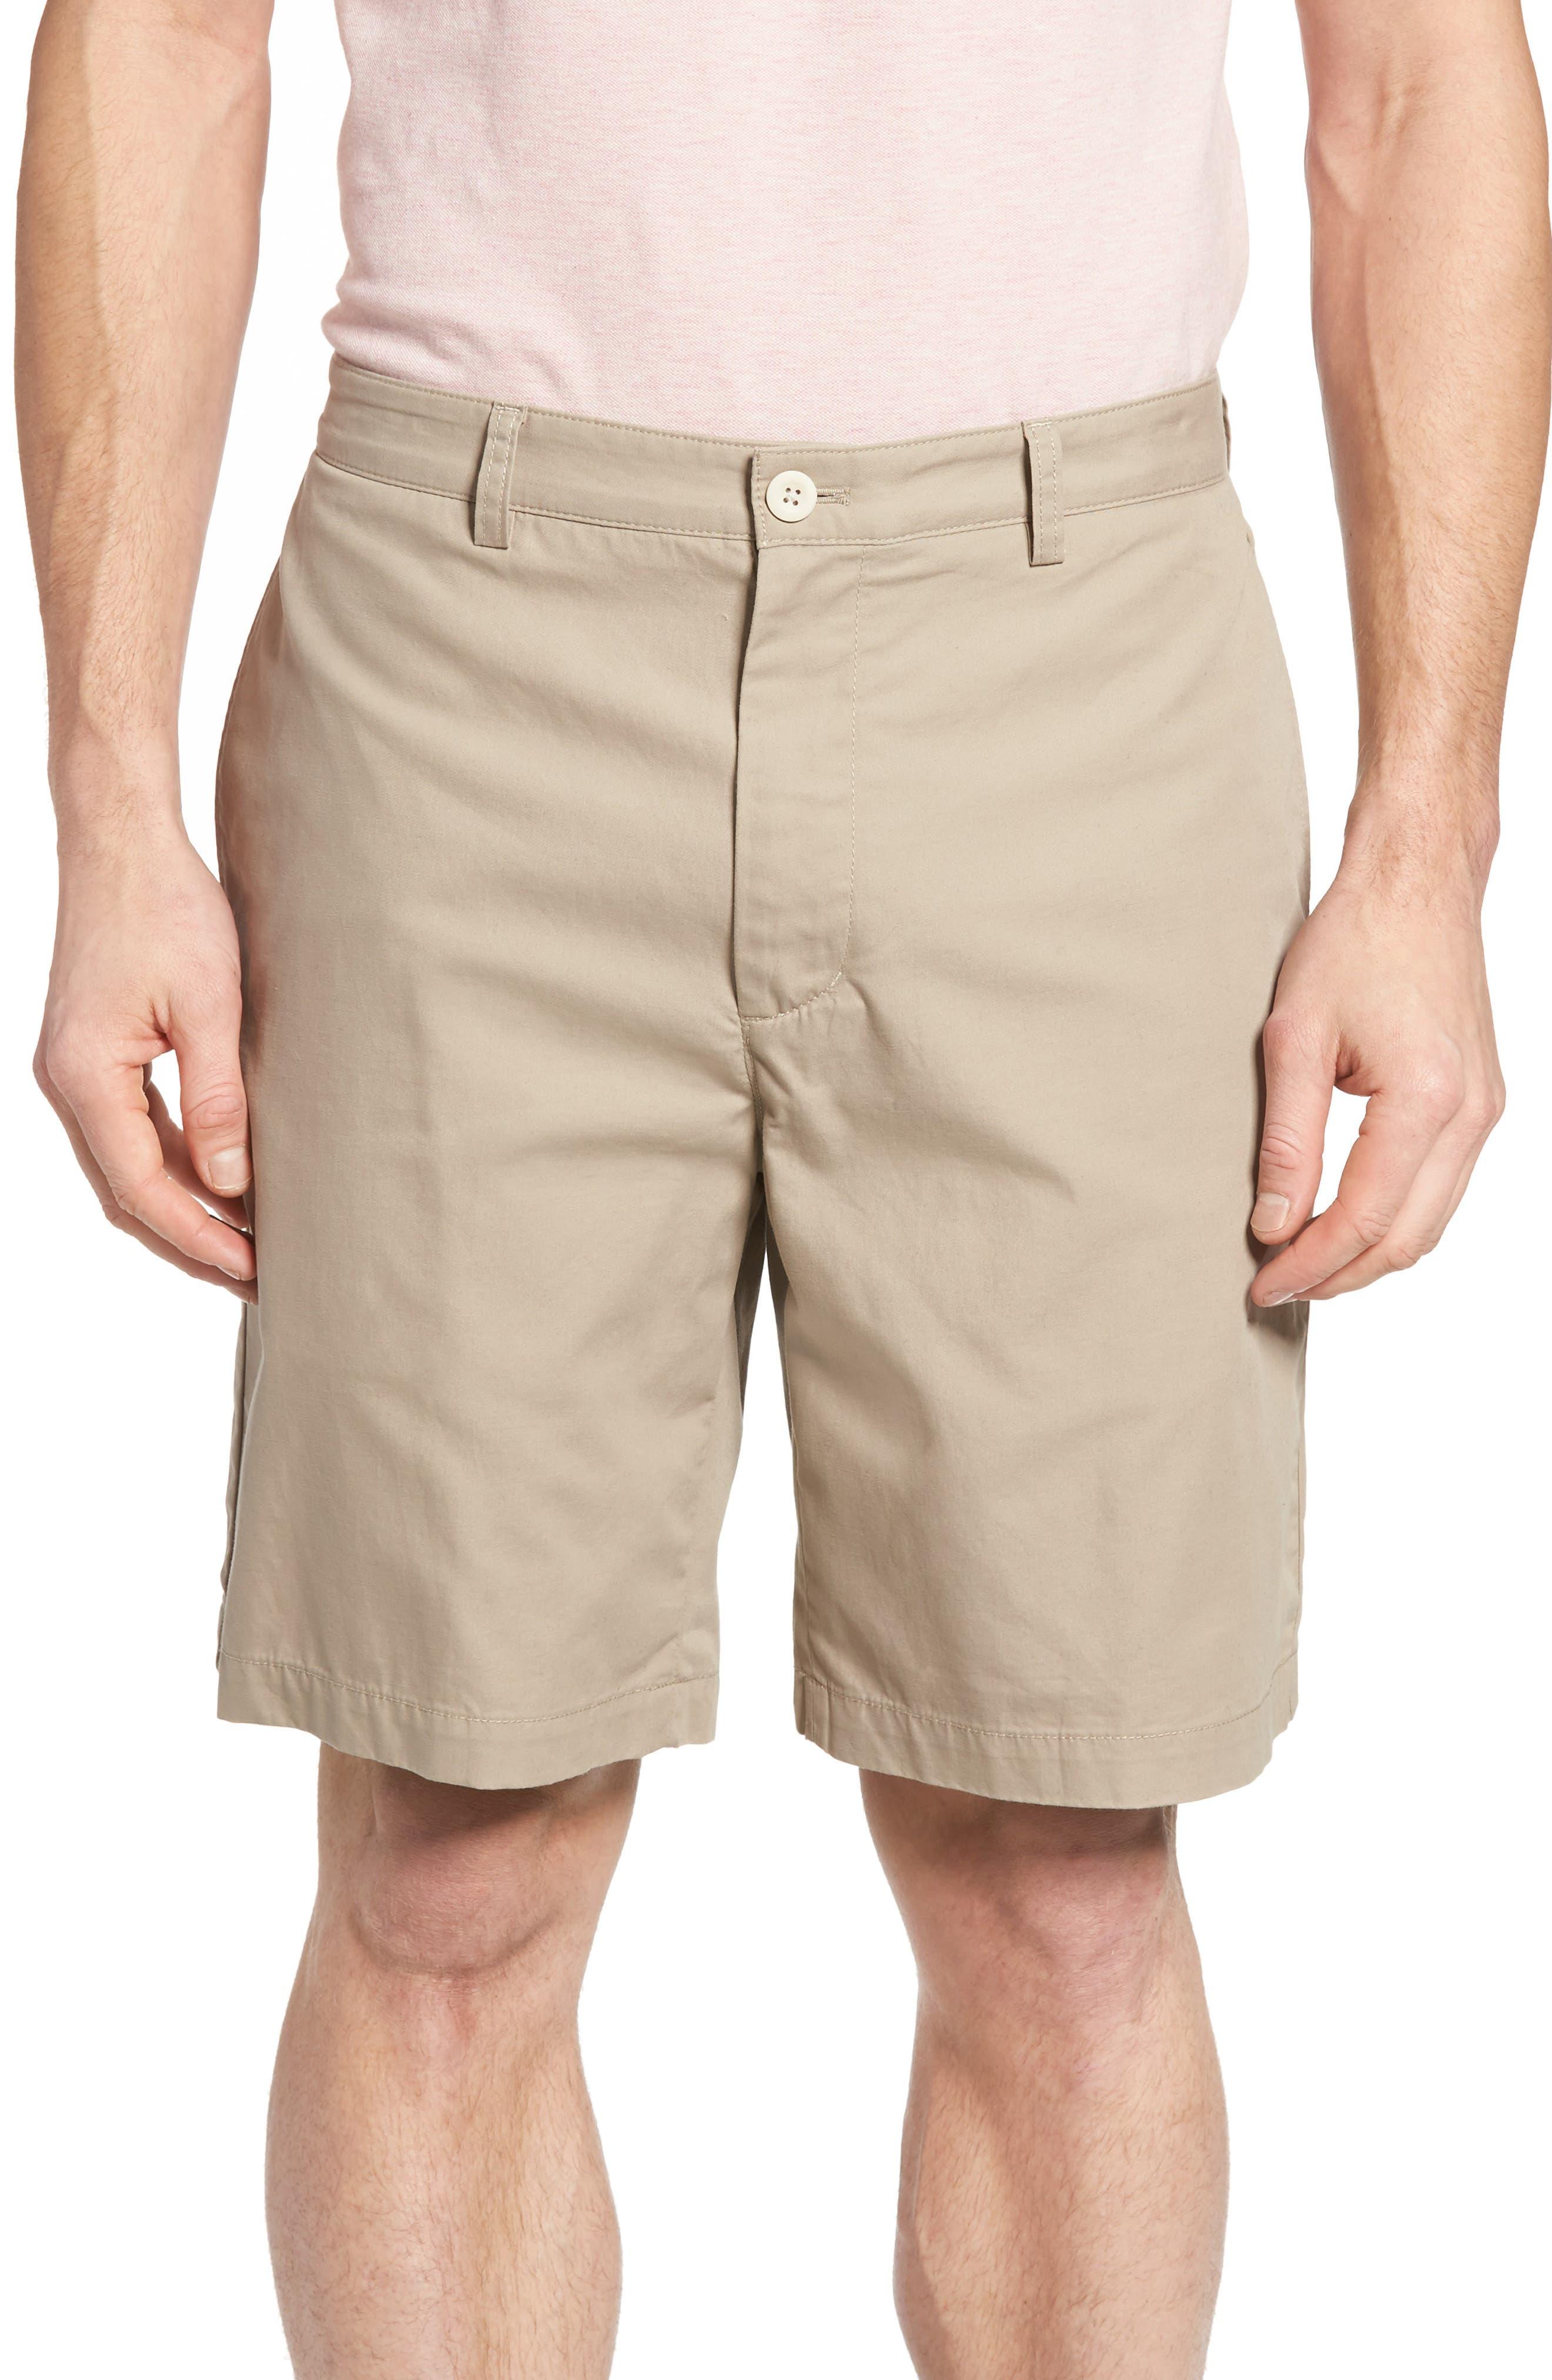 Men's Vineyard Vines 9 Inch Stretch Breaker Shorts